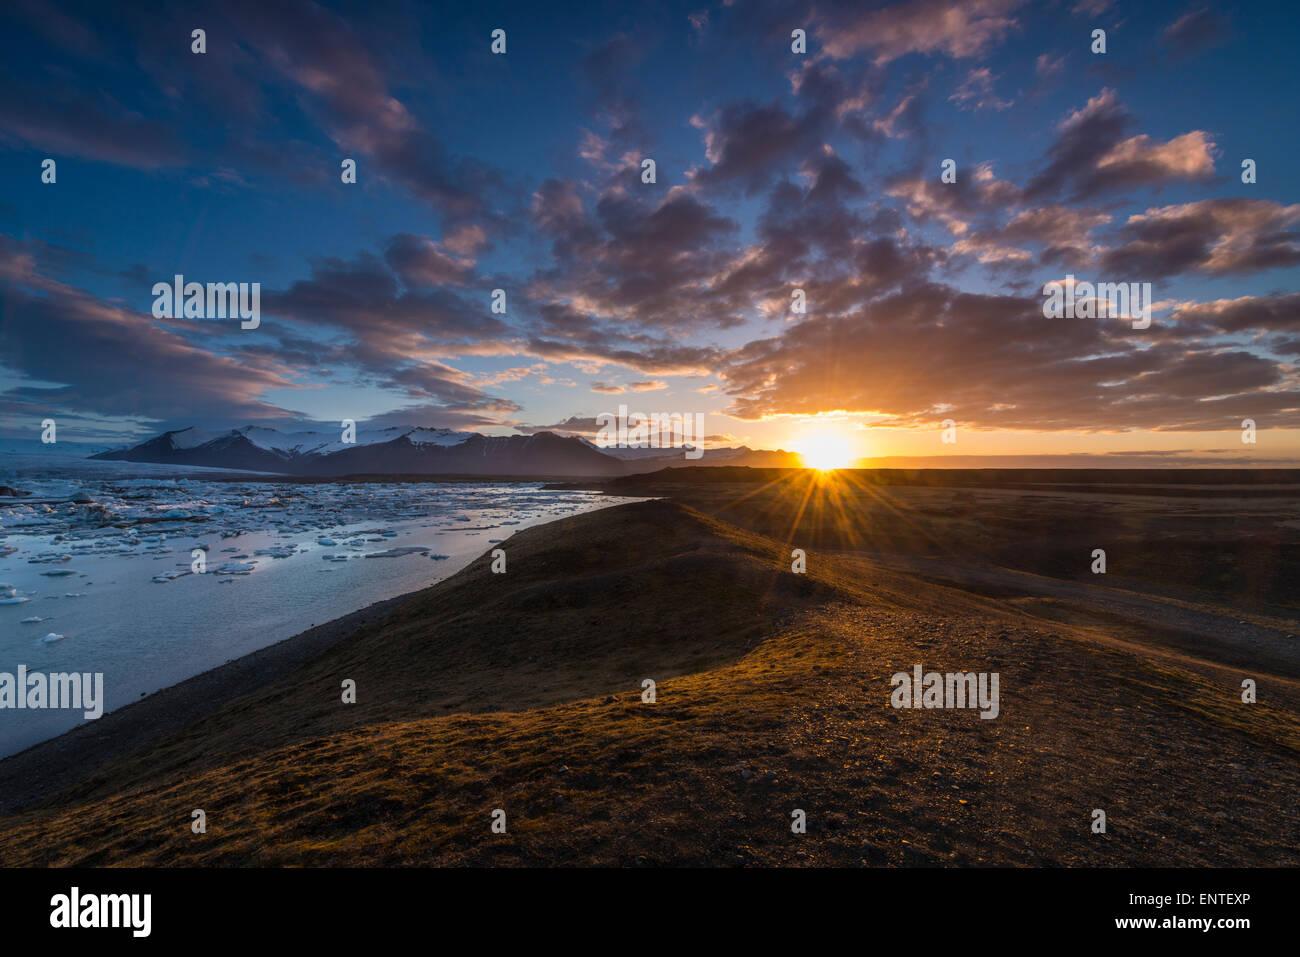 Islanda paesaggio - Sunrise all'alba a Jokulsarlon Laguna, Vatnajokull National Park, Islanda Immagini Stock